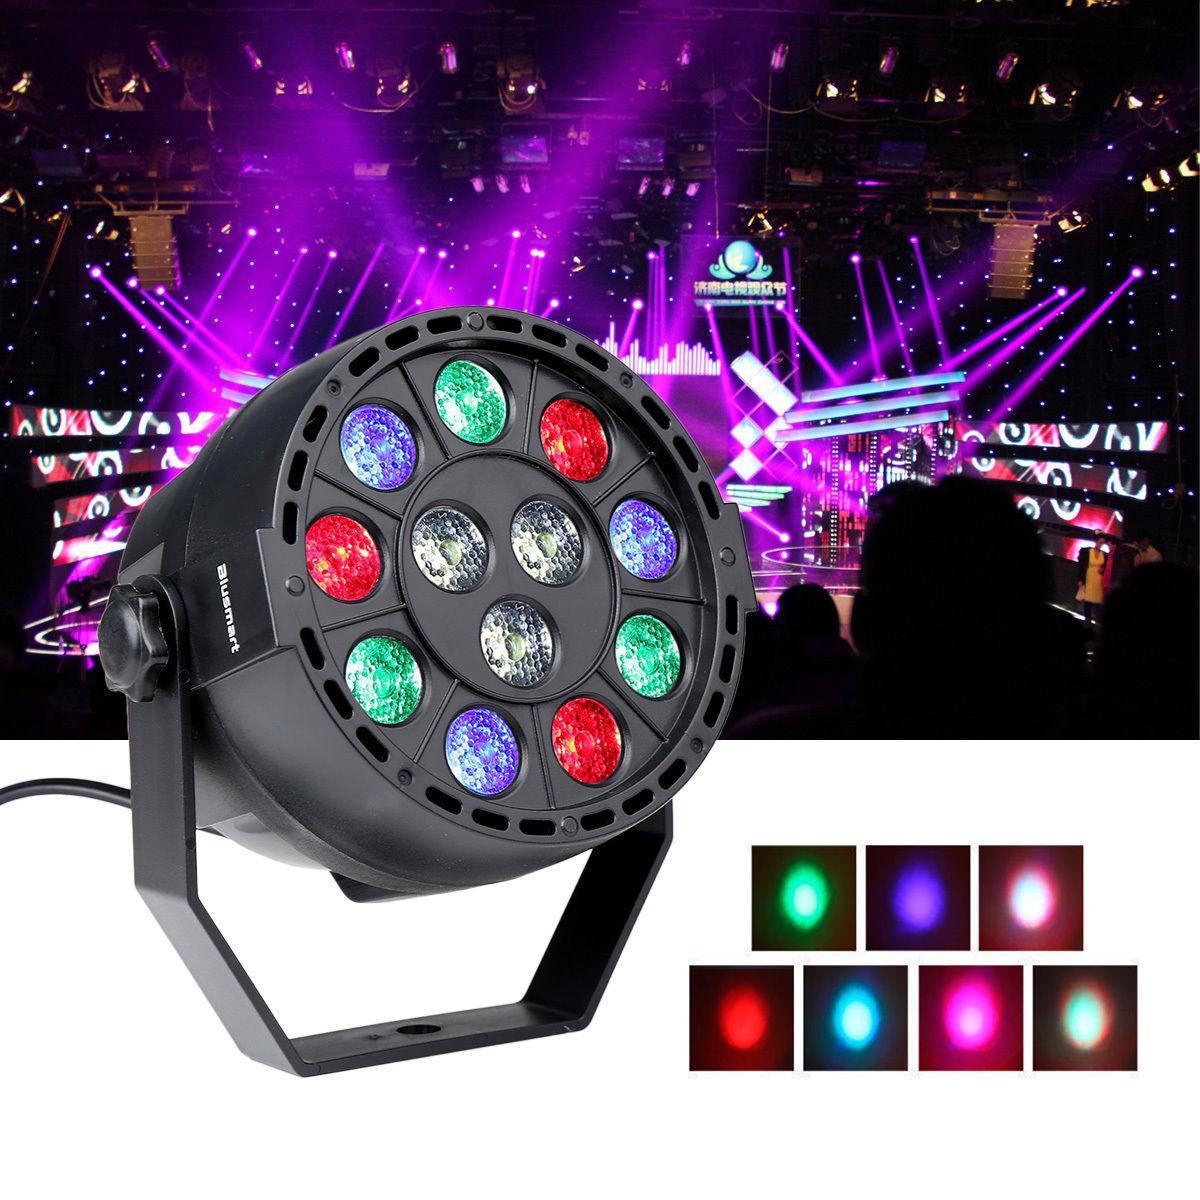 Disco DJ luz DMX512 luces de fiesta RGBW LED de alta potencia etapa PAR luz estroboscópica 8 canales fiesta Disco Show 30W AC 90-240V